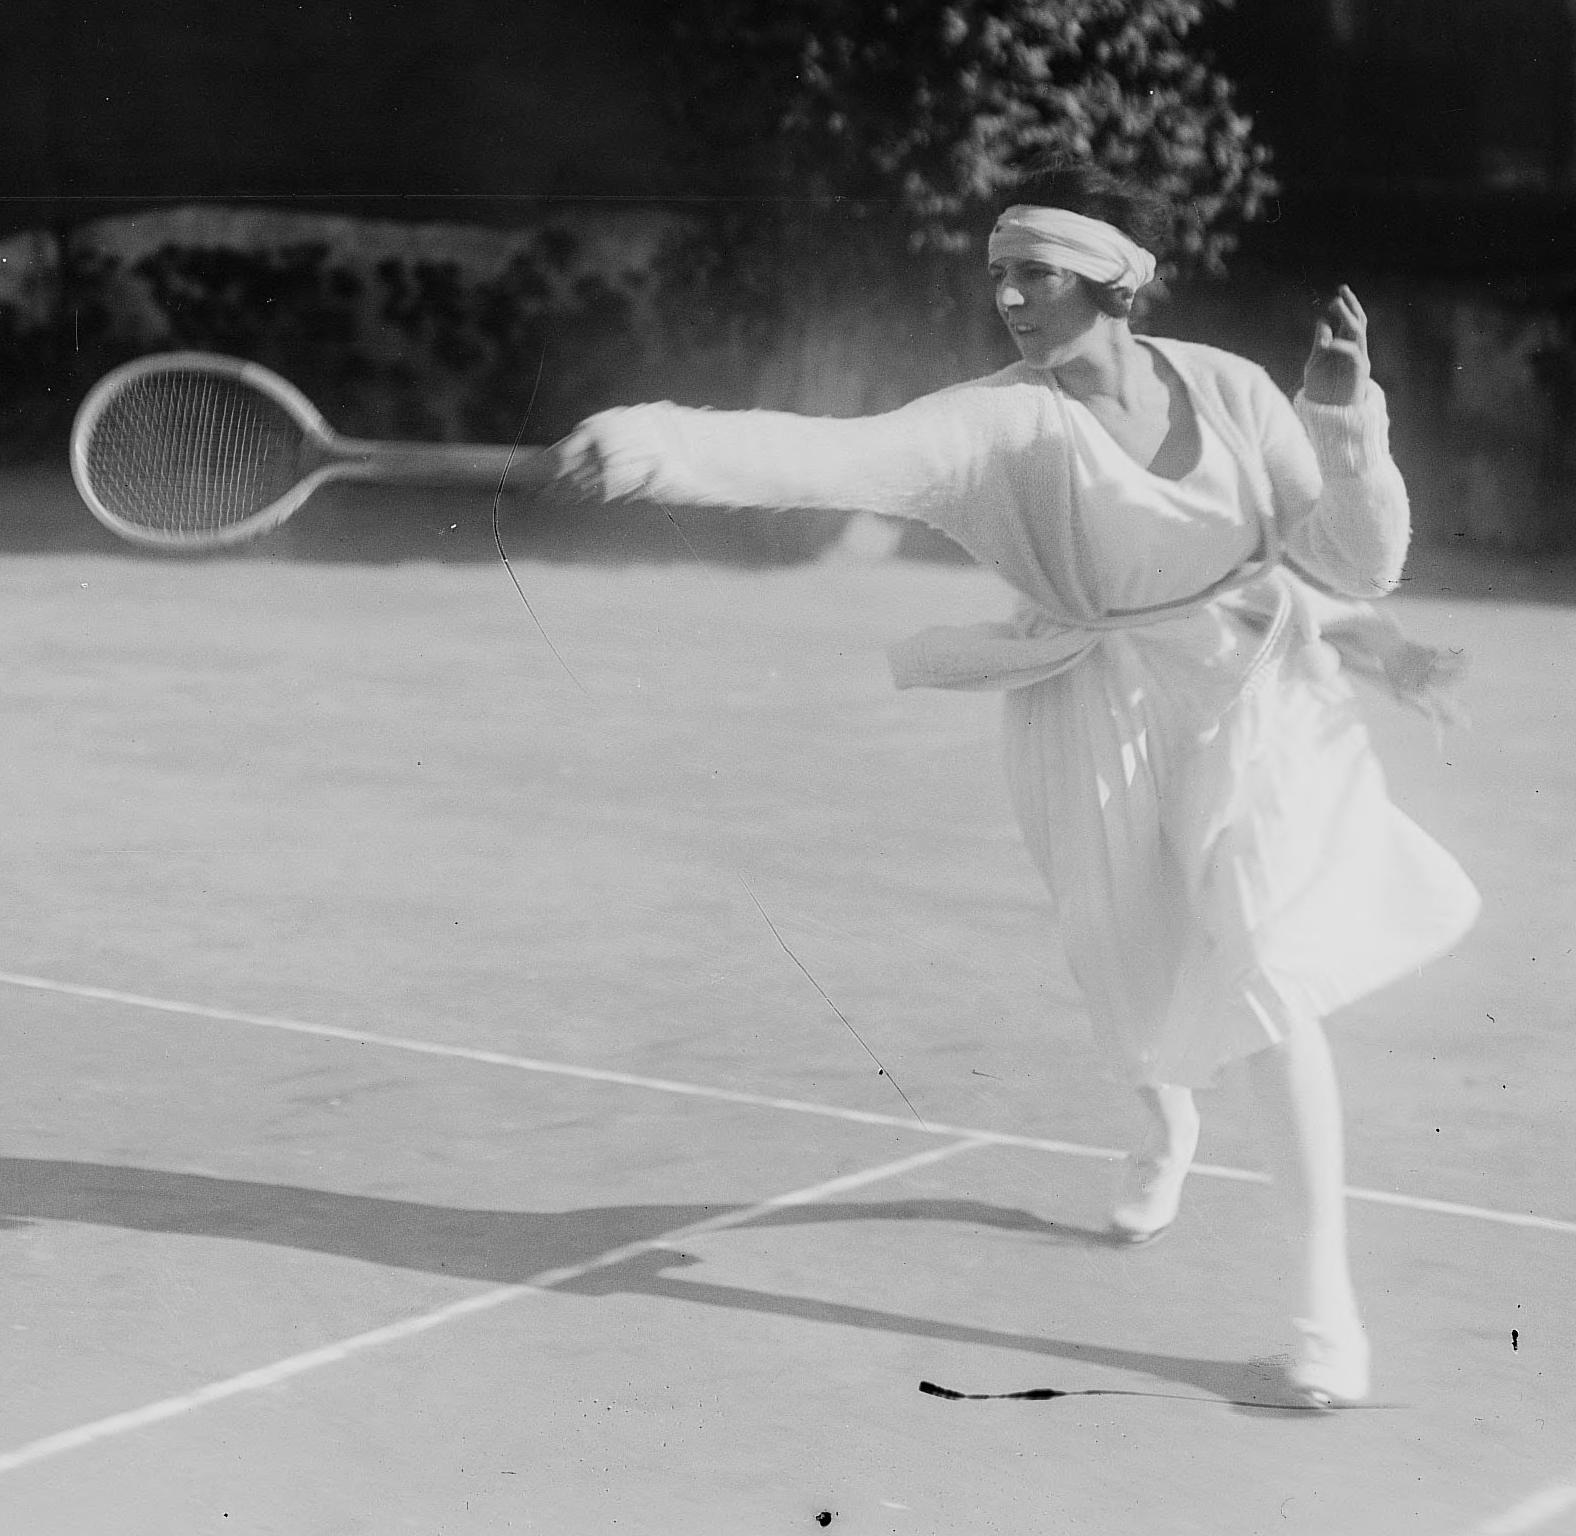 Suzanne Lenglen 1920s Olympics